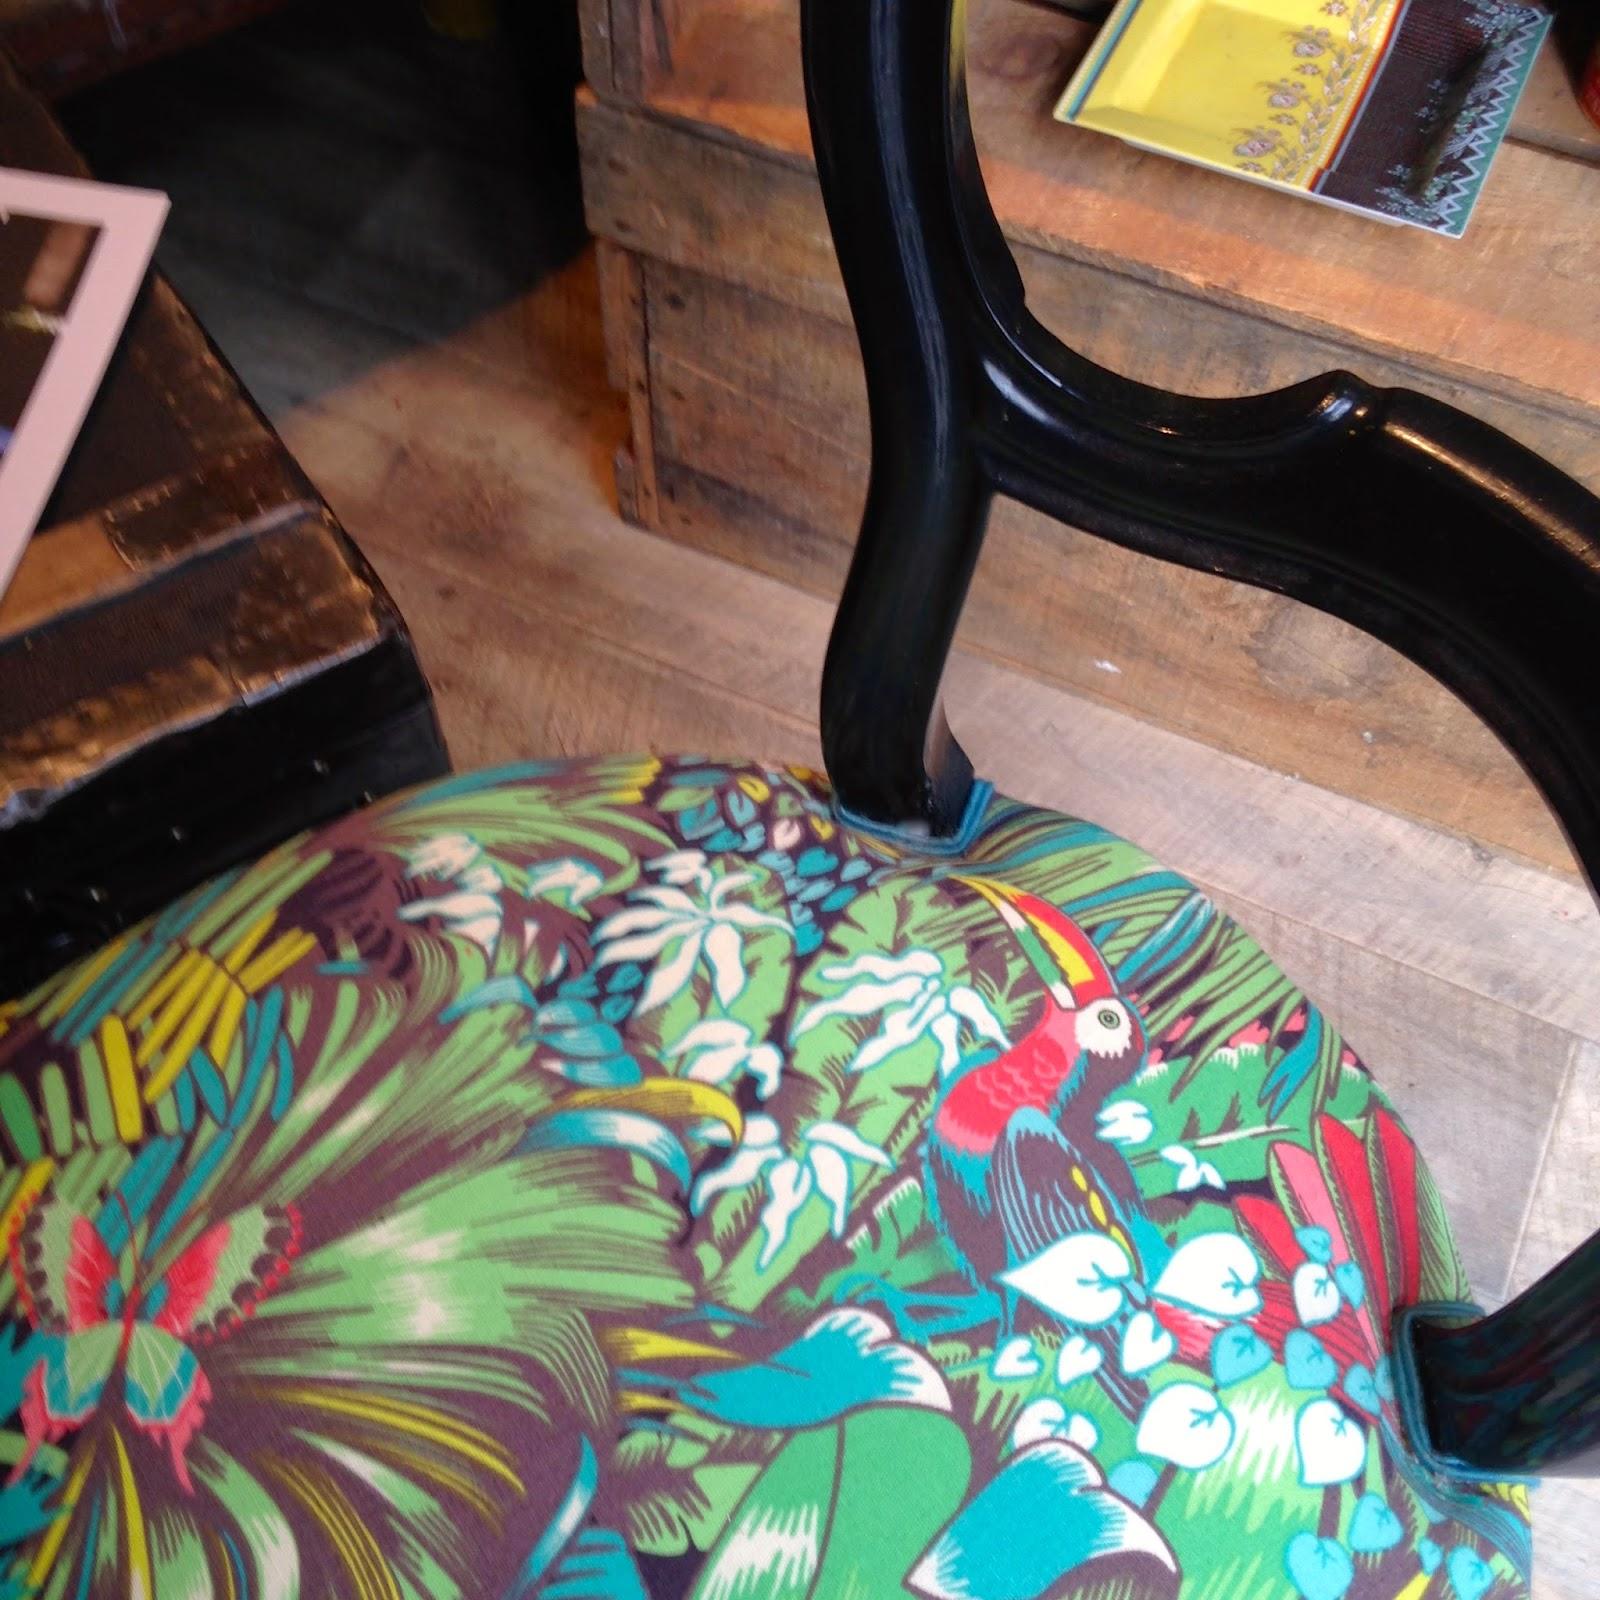 Jungle beat tissu ameublement chaise fauteuil canap for Tissu pour recouvrir chaise